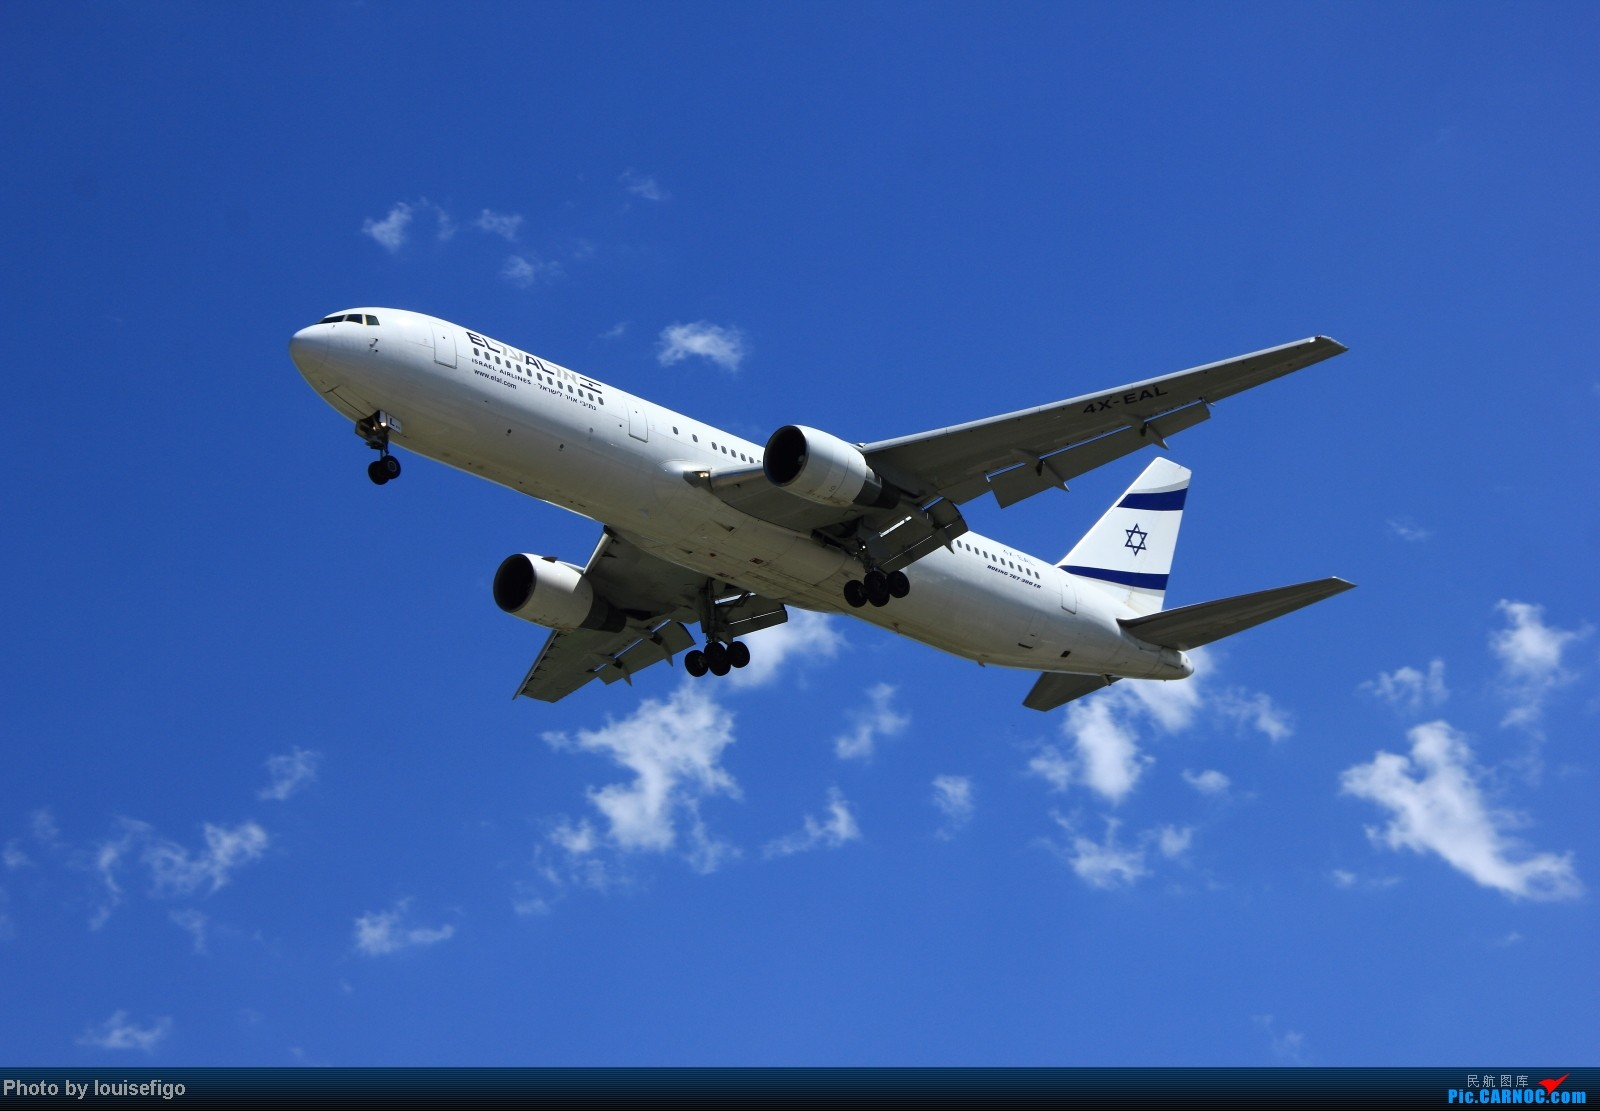 Re:[原创]三张图:来自特拉维夫的大卫星-以色列767. BOEING 767-300ER 4X-EAL 北京首都国际机场